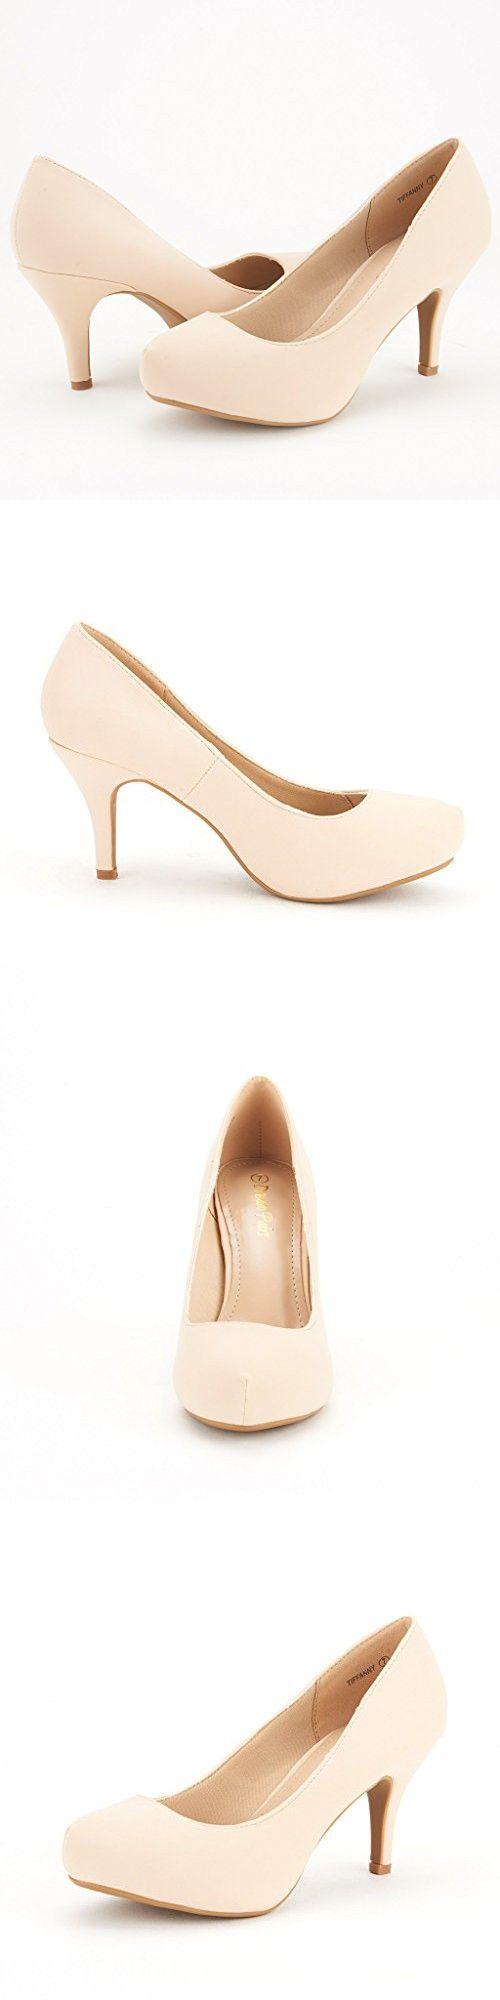 Low heel dress shoes for wedding  DREAM PAIRS TIFFANY Womenus Bridal Wedding Party Glitter Rhinestone